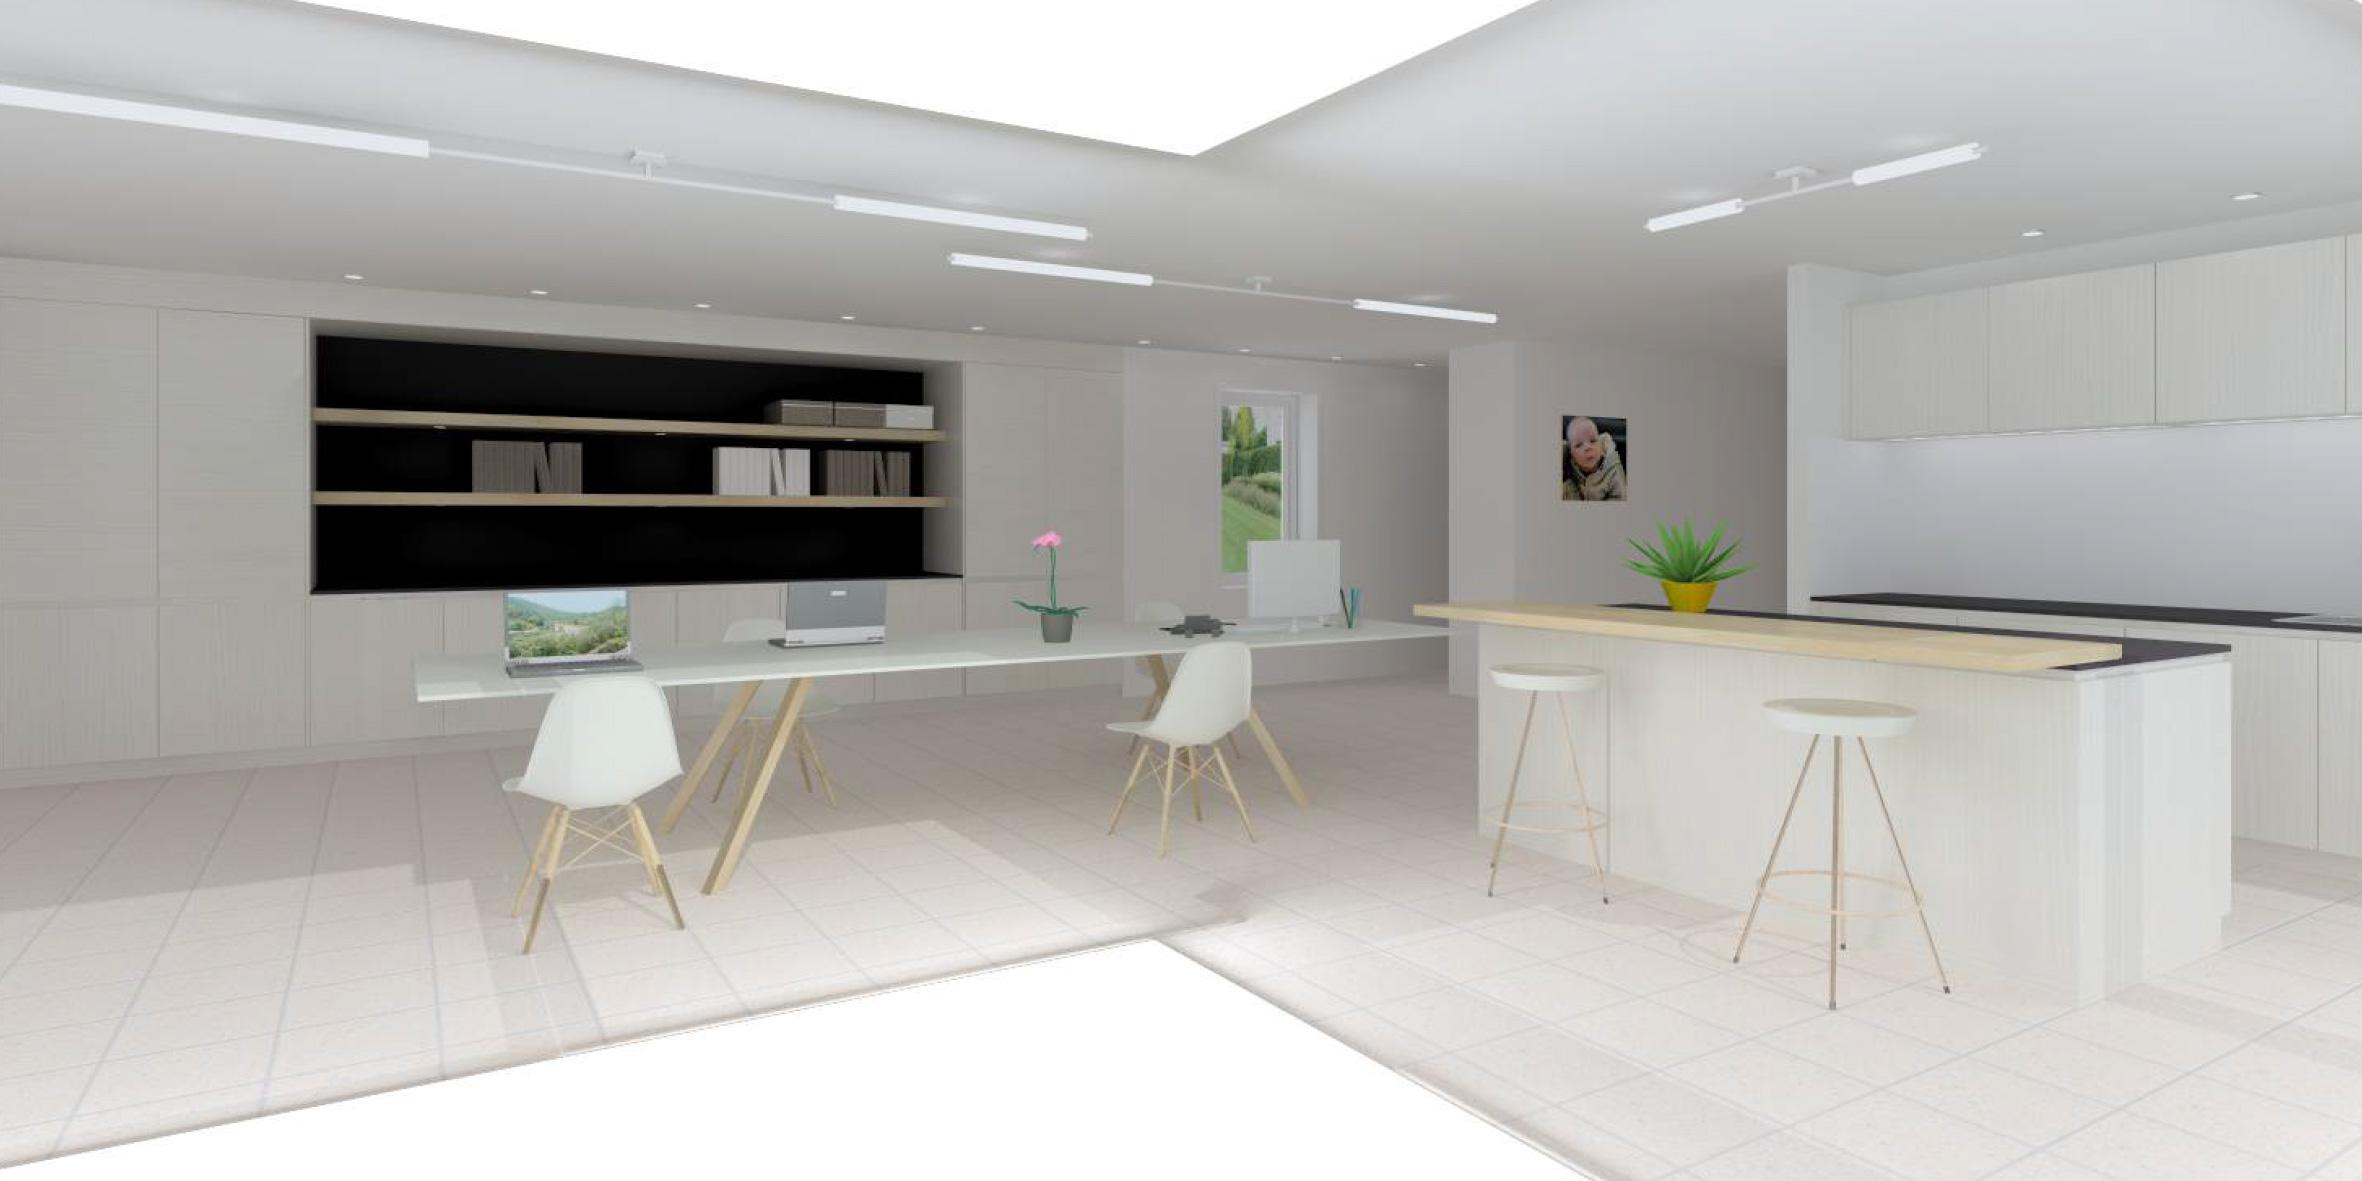 Kantoor architectenbureau flex design for Kantoor architect